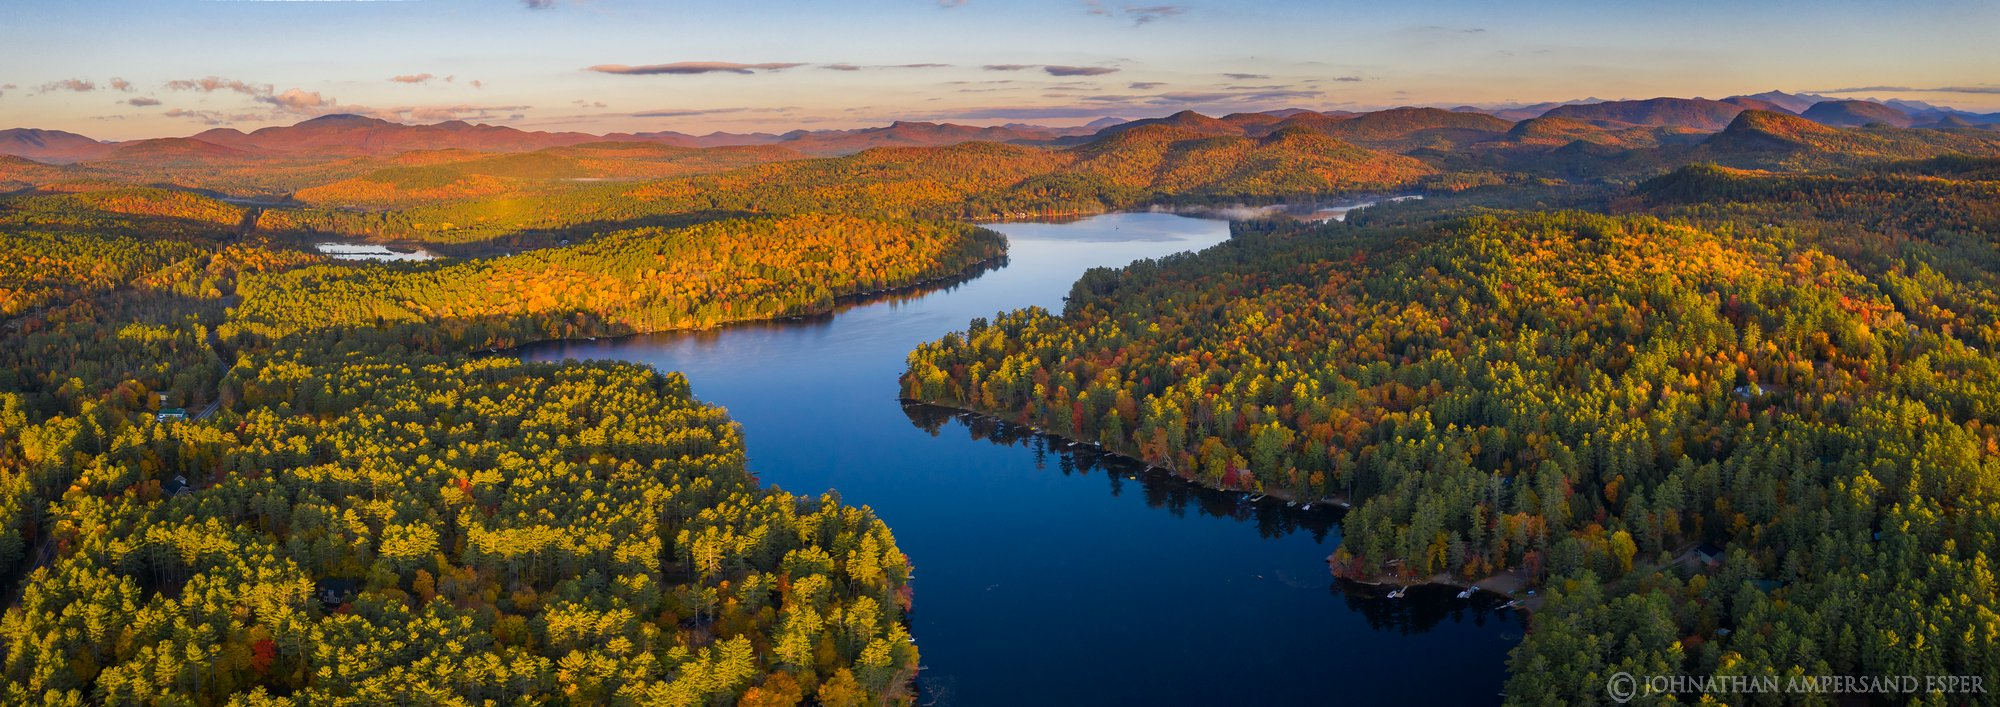 Loon Lake,drone,fall,2019,autumn,panorama,drone panorama,Gore Mt,High Peaks,, photo